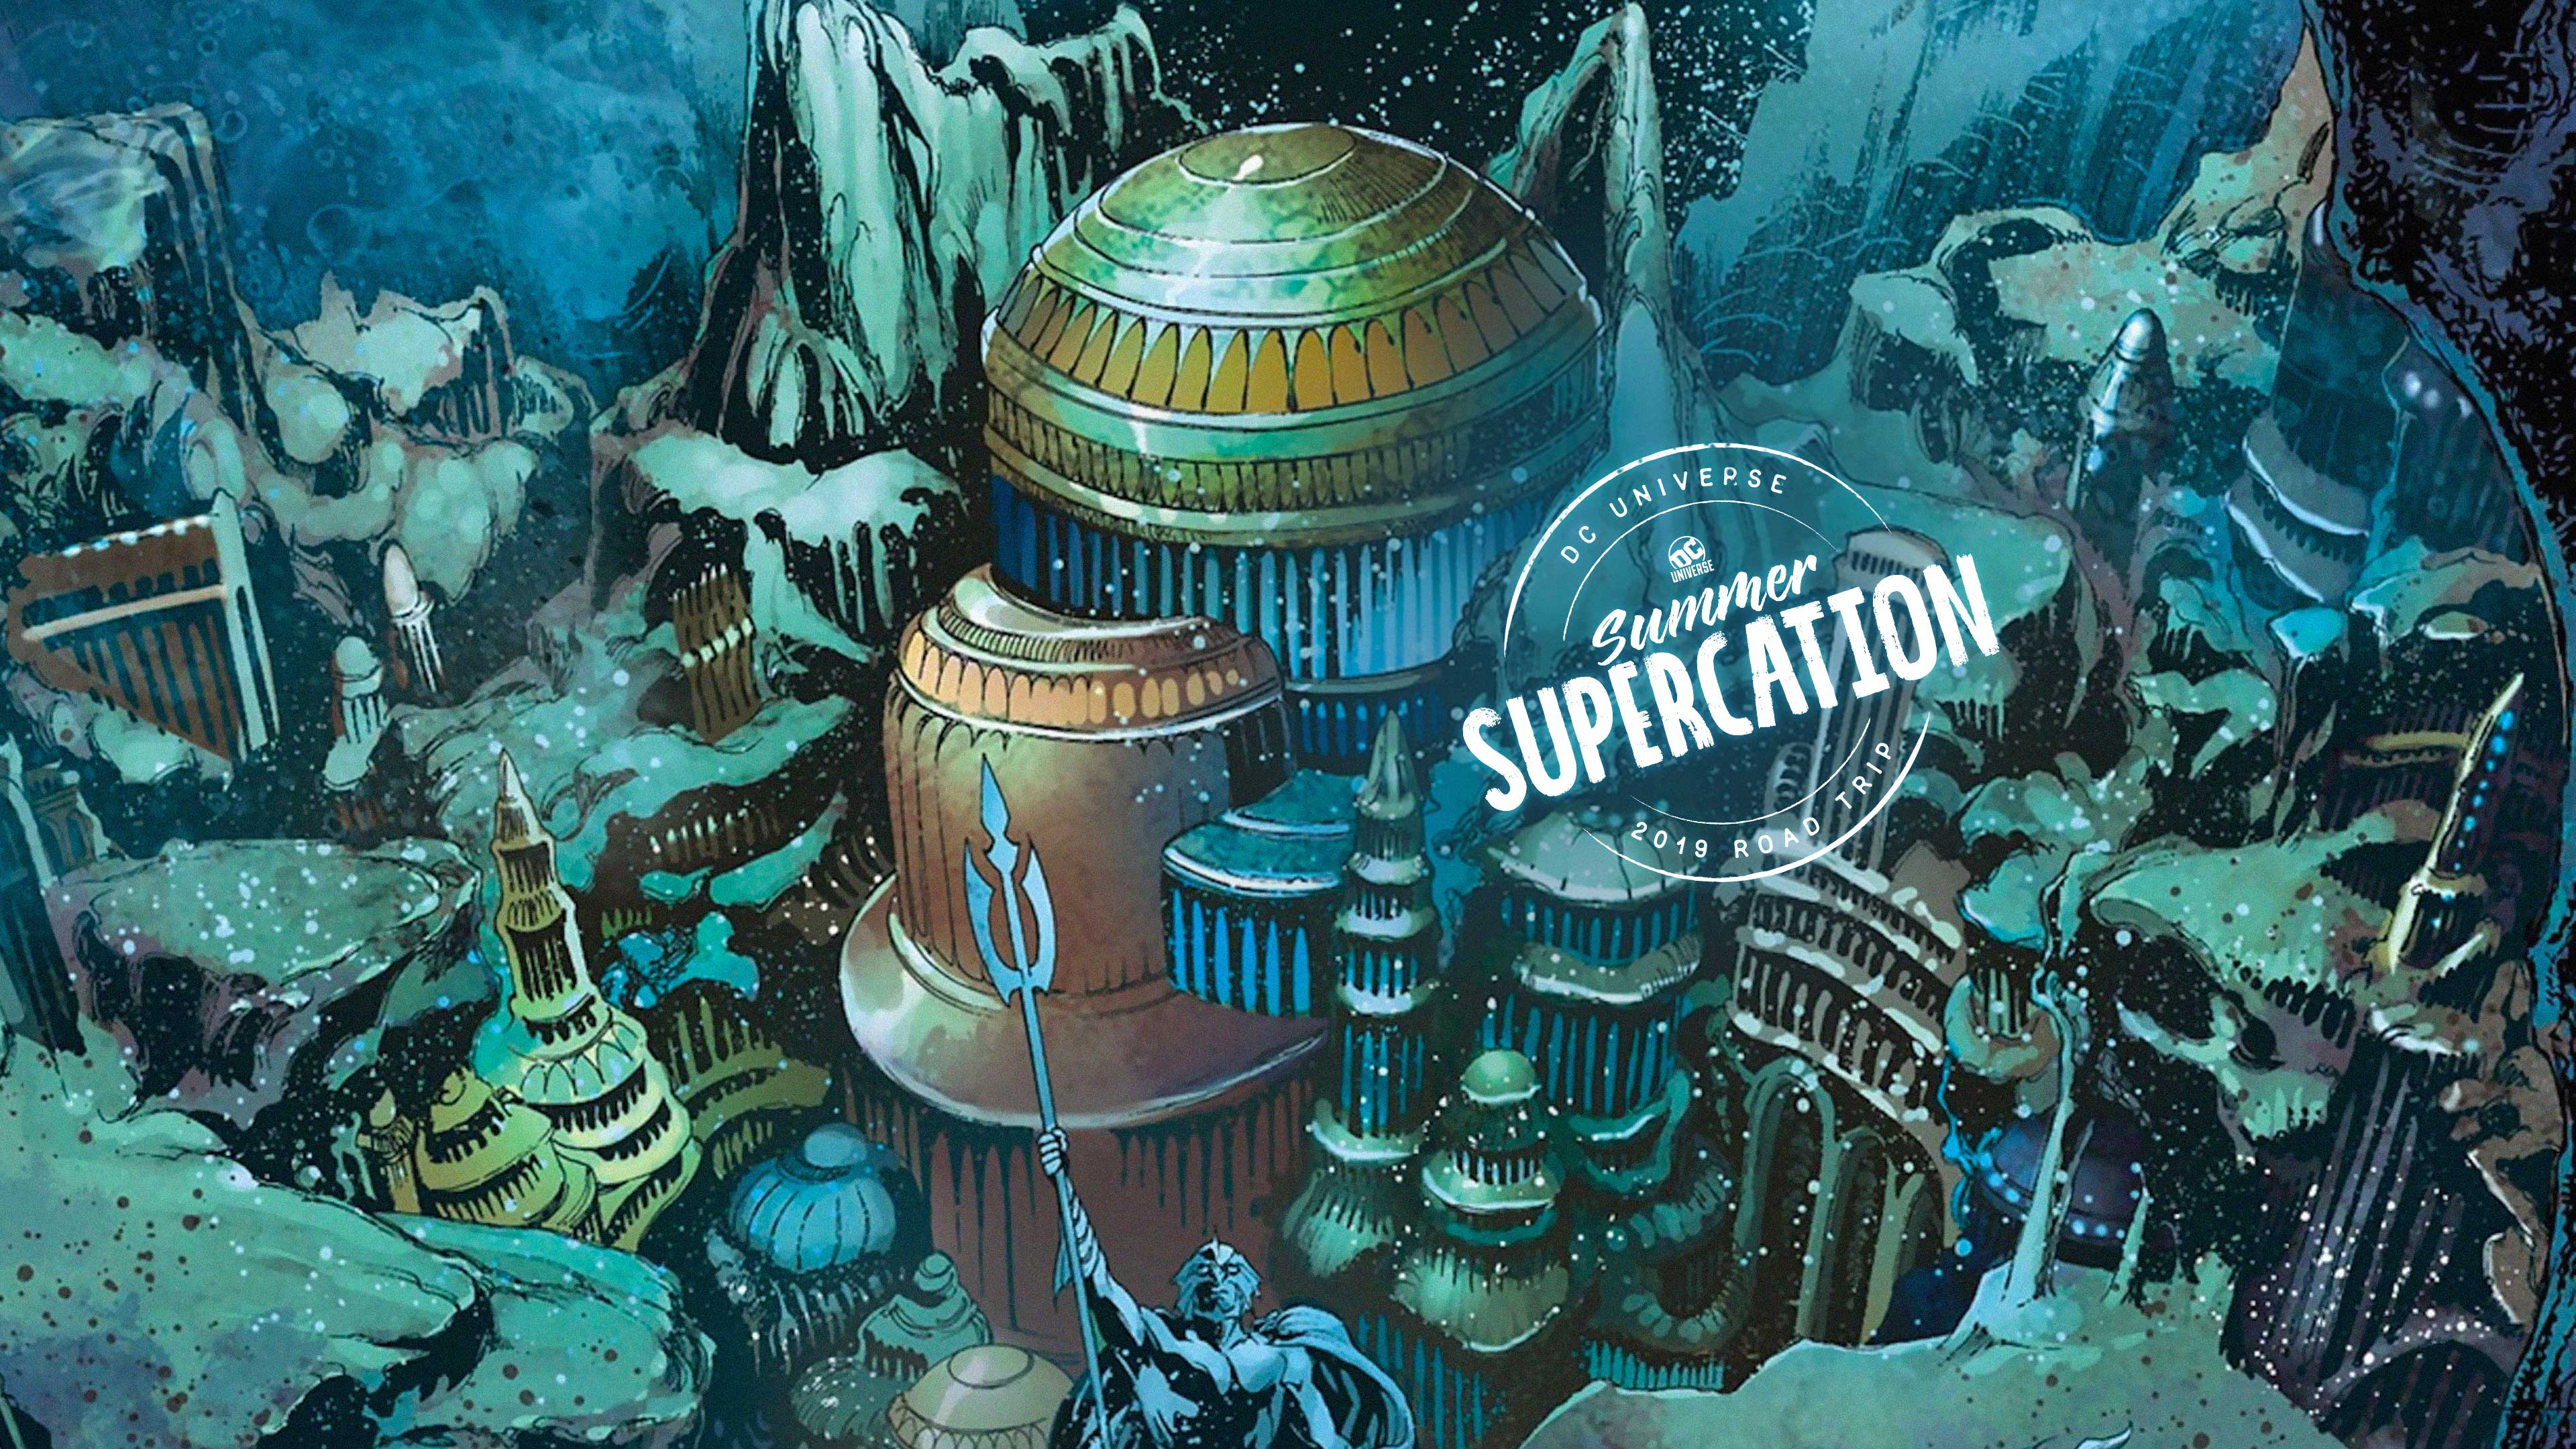 supersummercation_atlantis1_news_hero_190620_v1.jpg